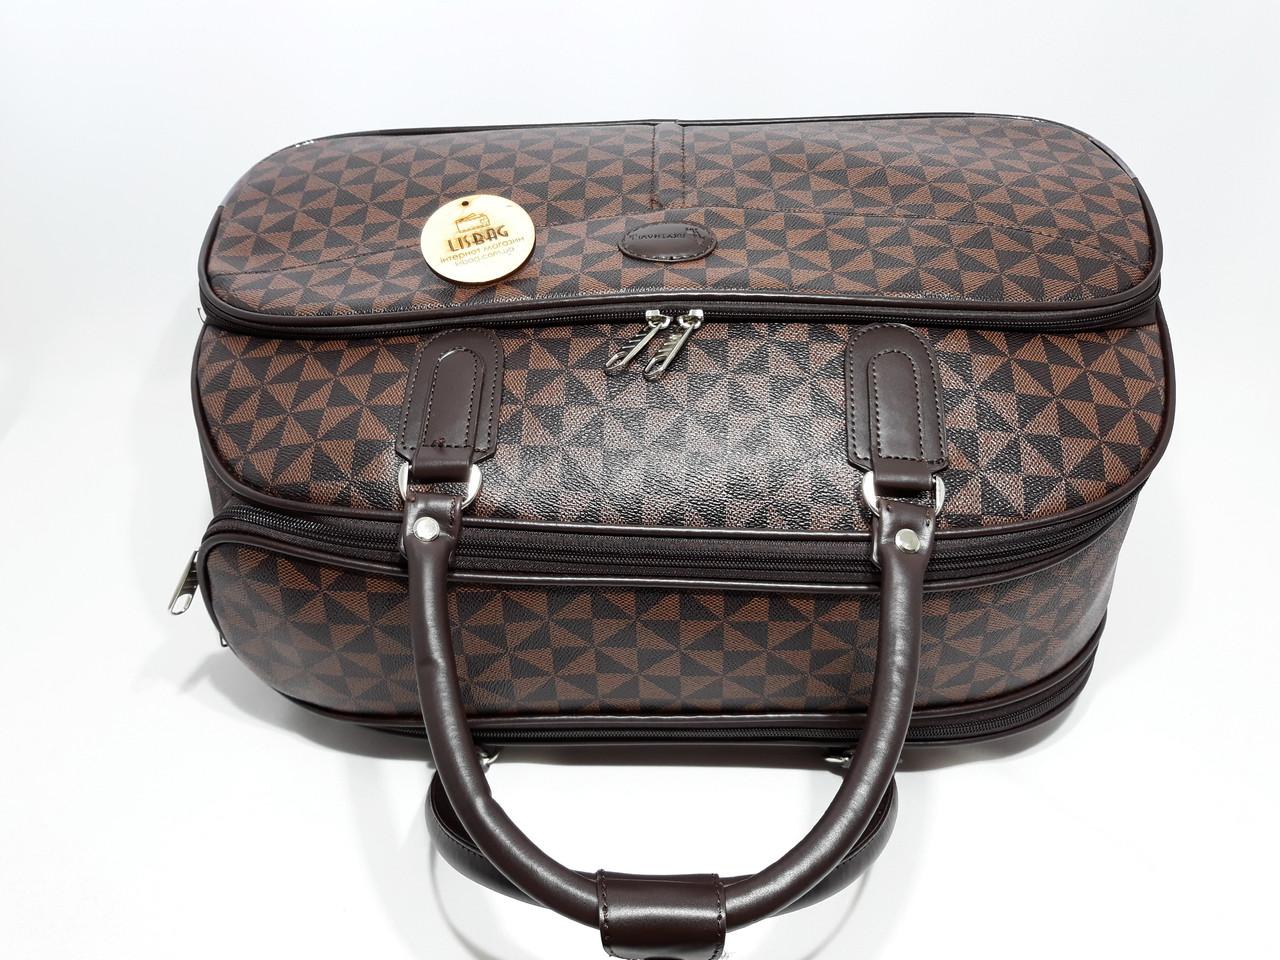 5072e7f73b9f Сумка на колесах большая XL Коричневая (59*31*38) чемодан дорожная сумка  валіза на колесах, цена 935 грн., купить в Умани — Prom.ua (ID#743550350)